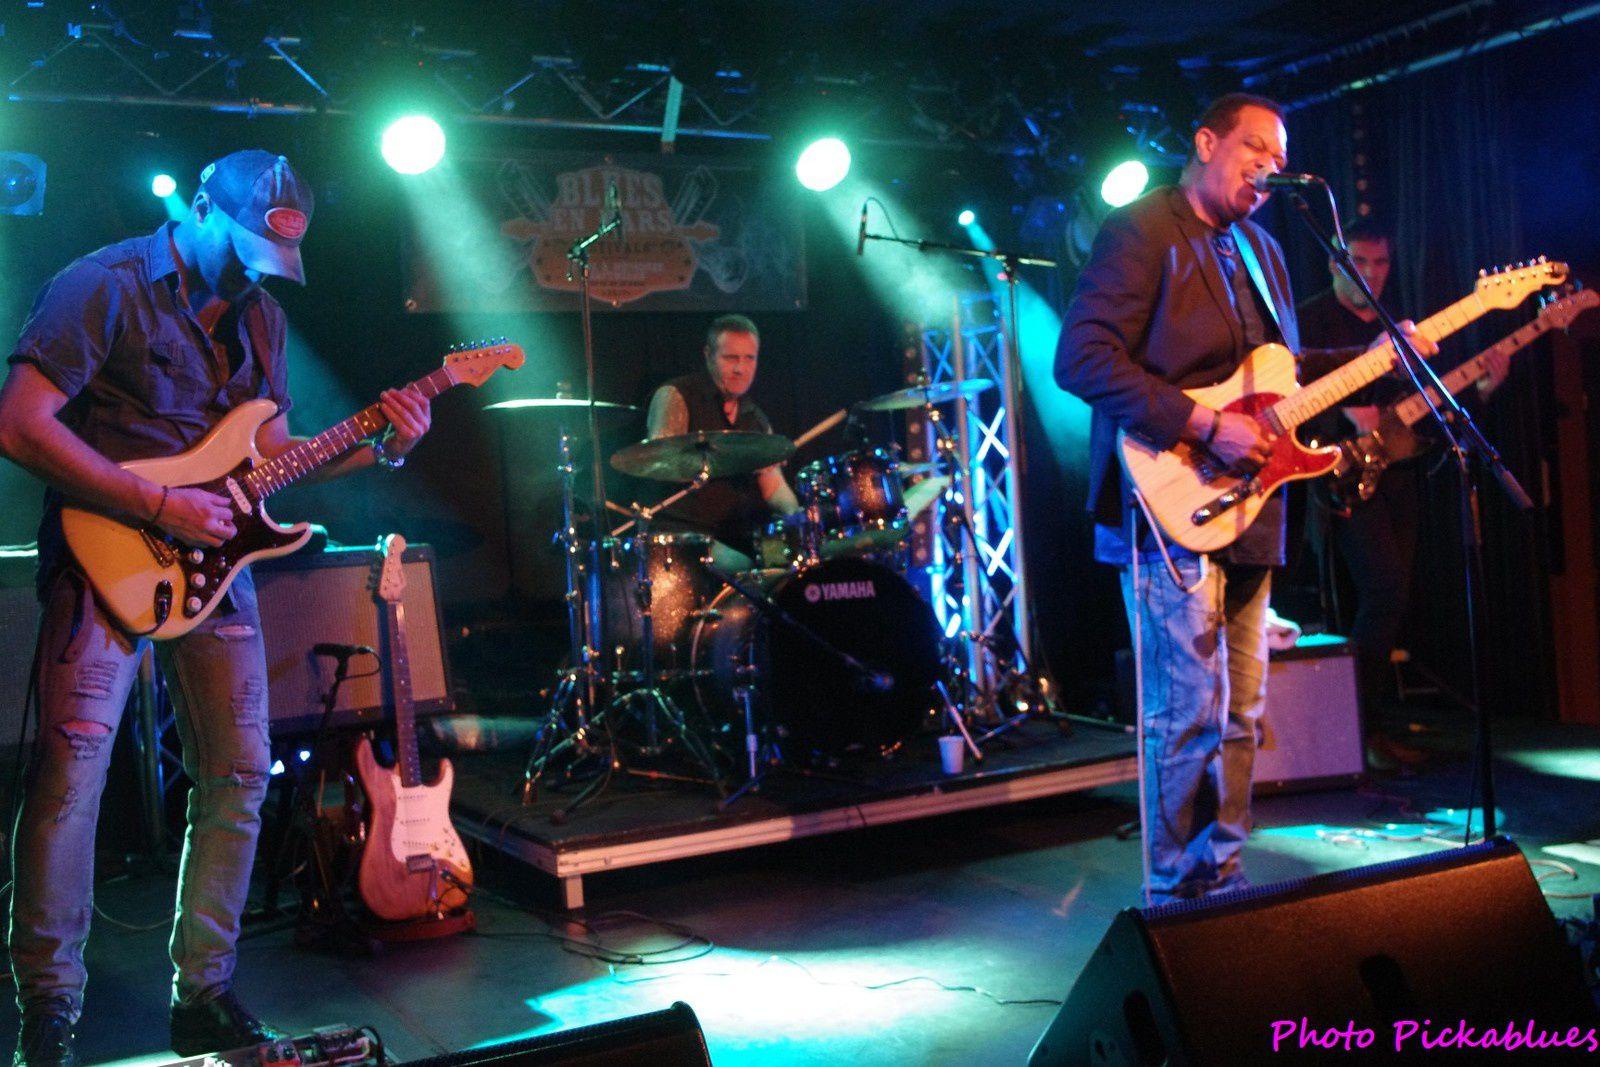 Tim Mitchell Band - 26 mars 2017 - La Boite à Musiques, Wattrelos (59)